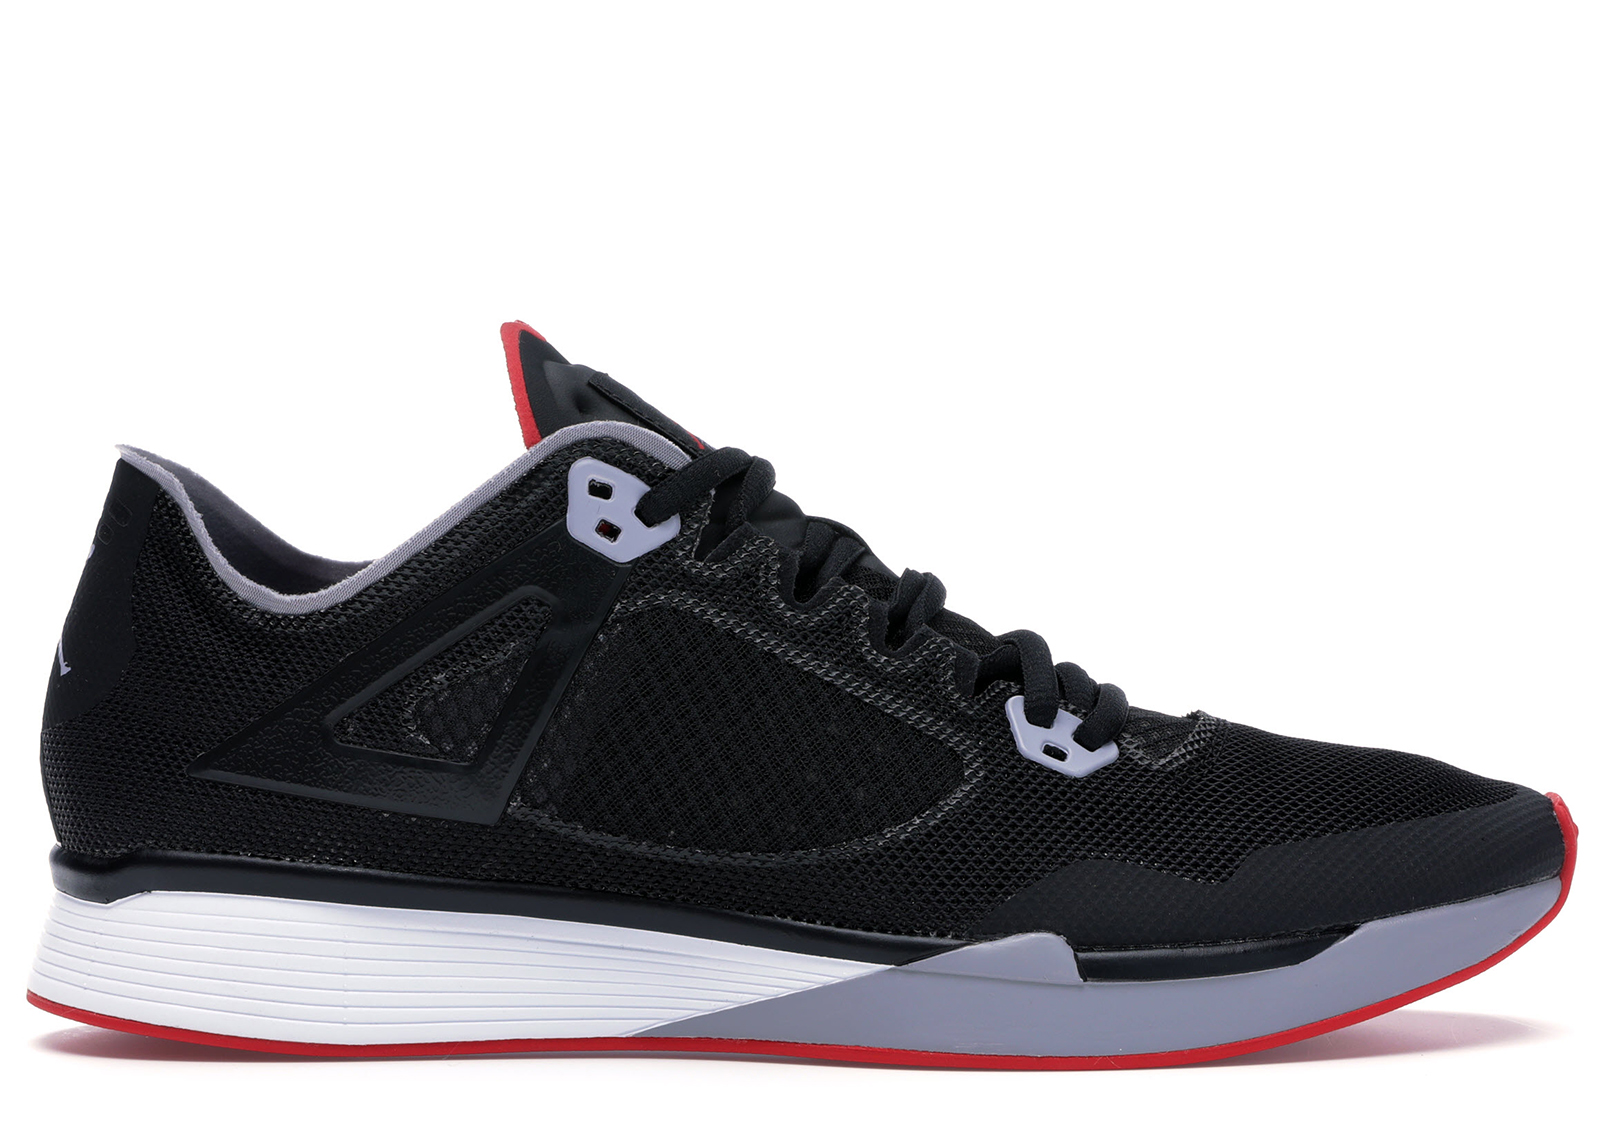 Jordan 89 Racer Black - AQ3747-006